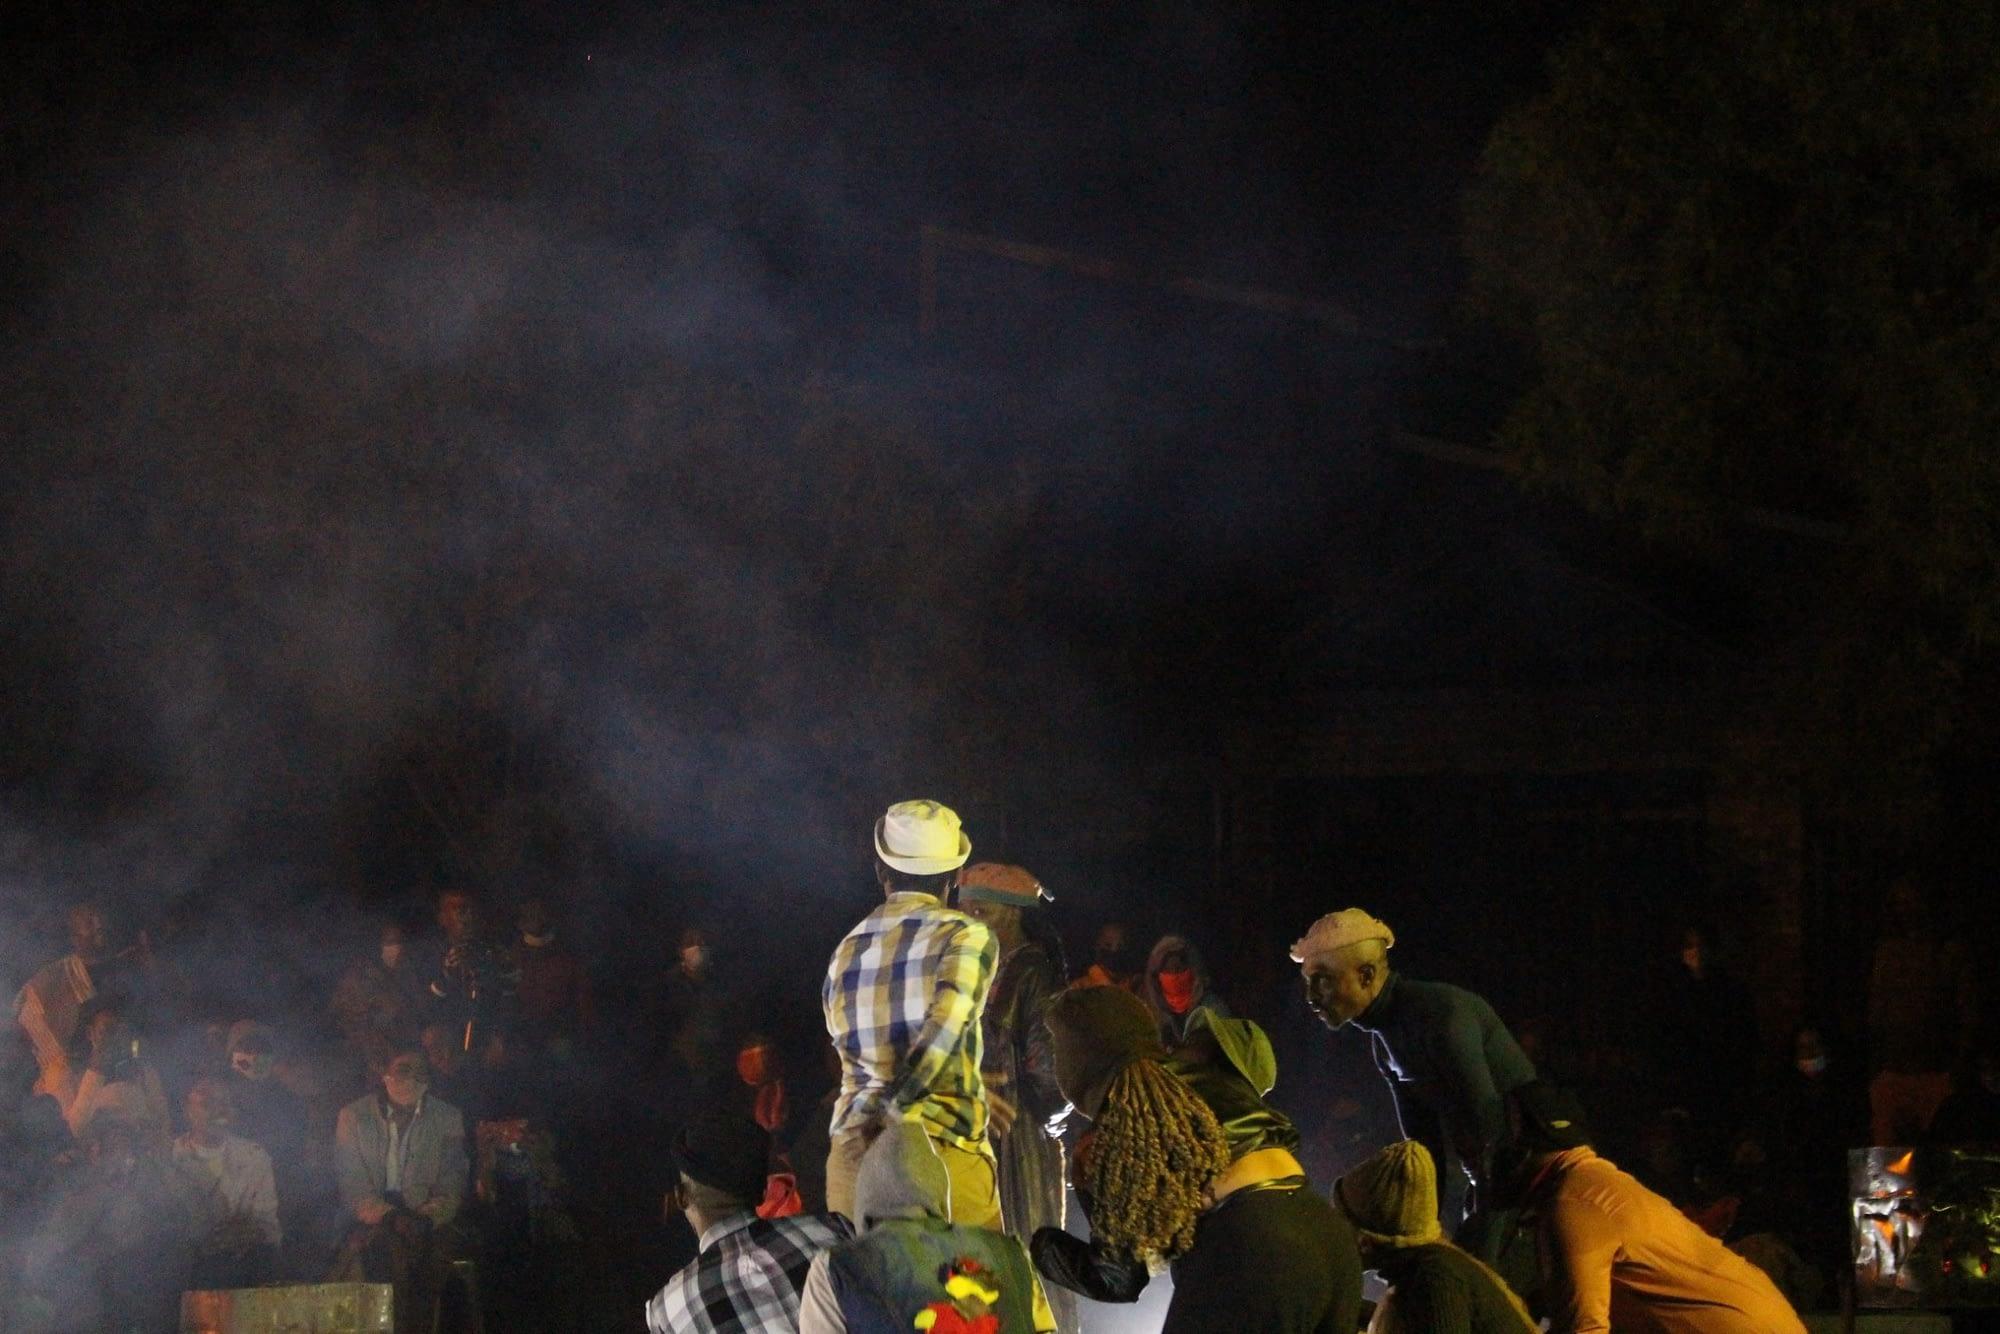 Kgafela oa Magogodi's Chilahaeboalae at Funda Community College (photos by Omphemetse Ramatlhatse)